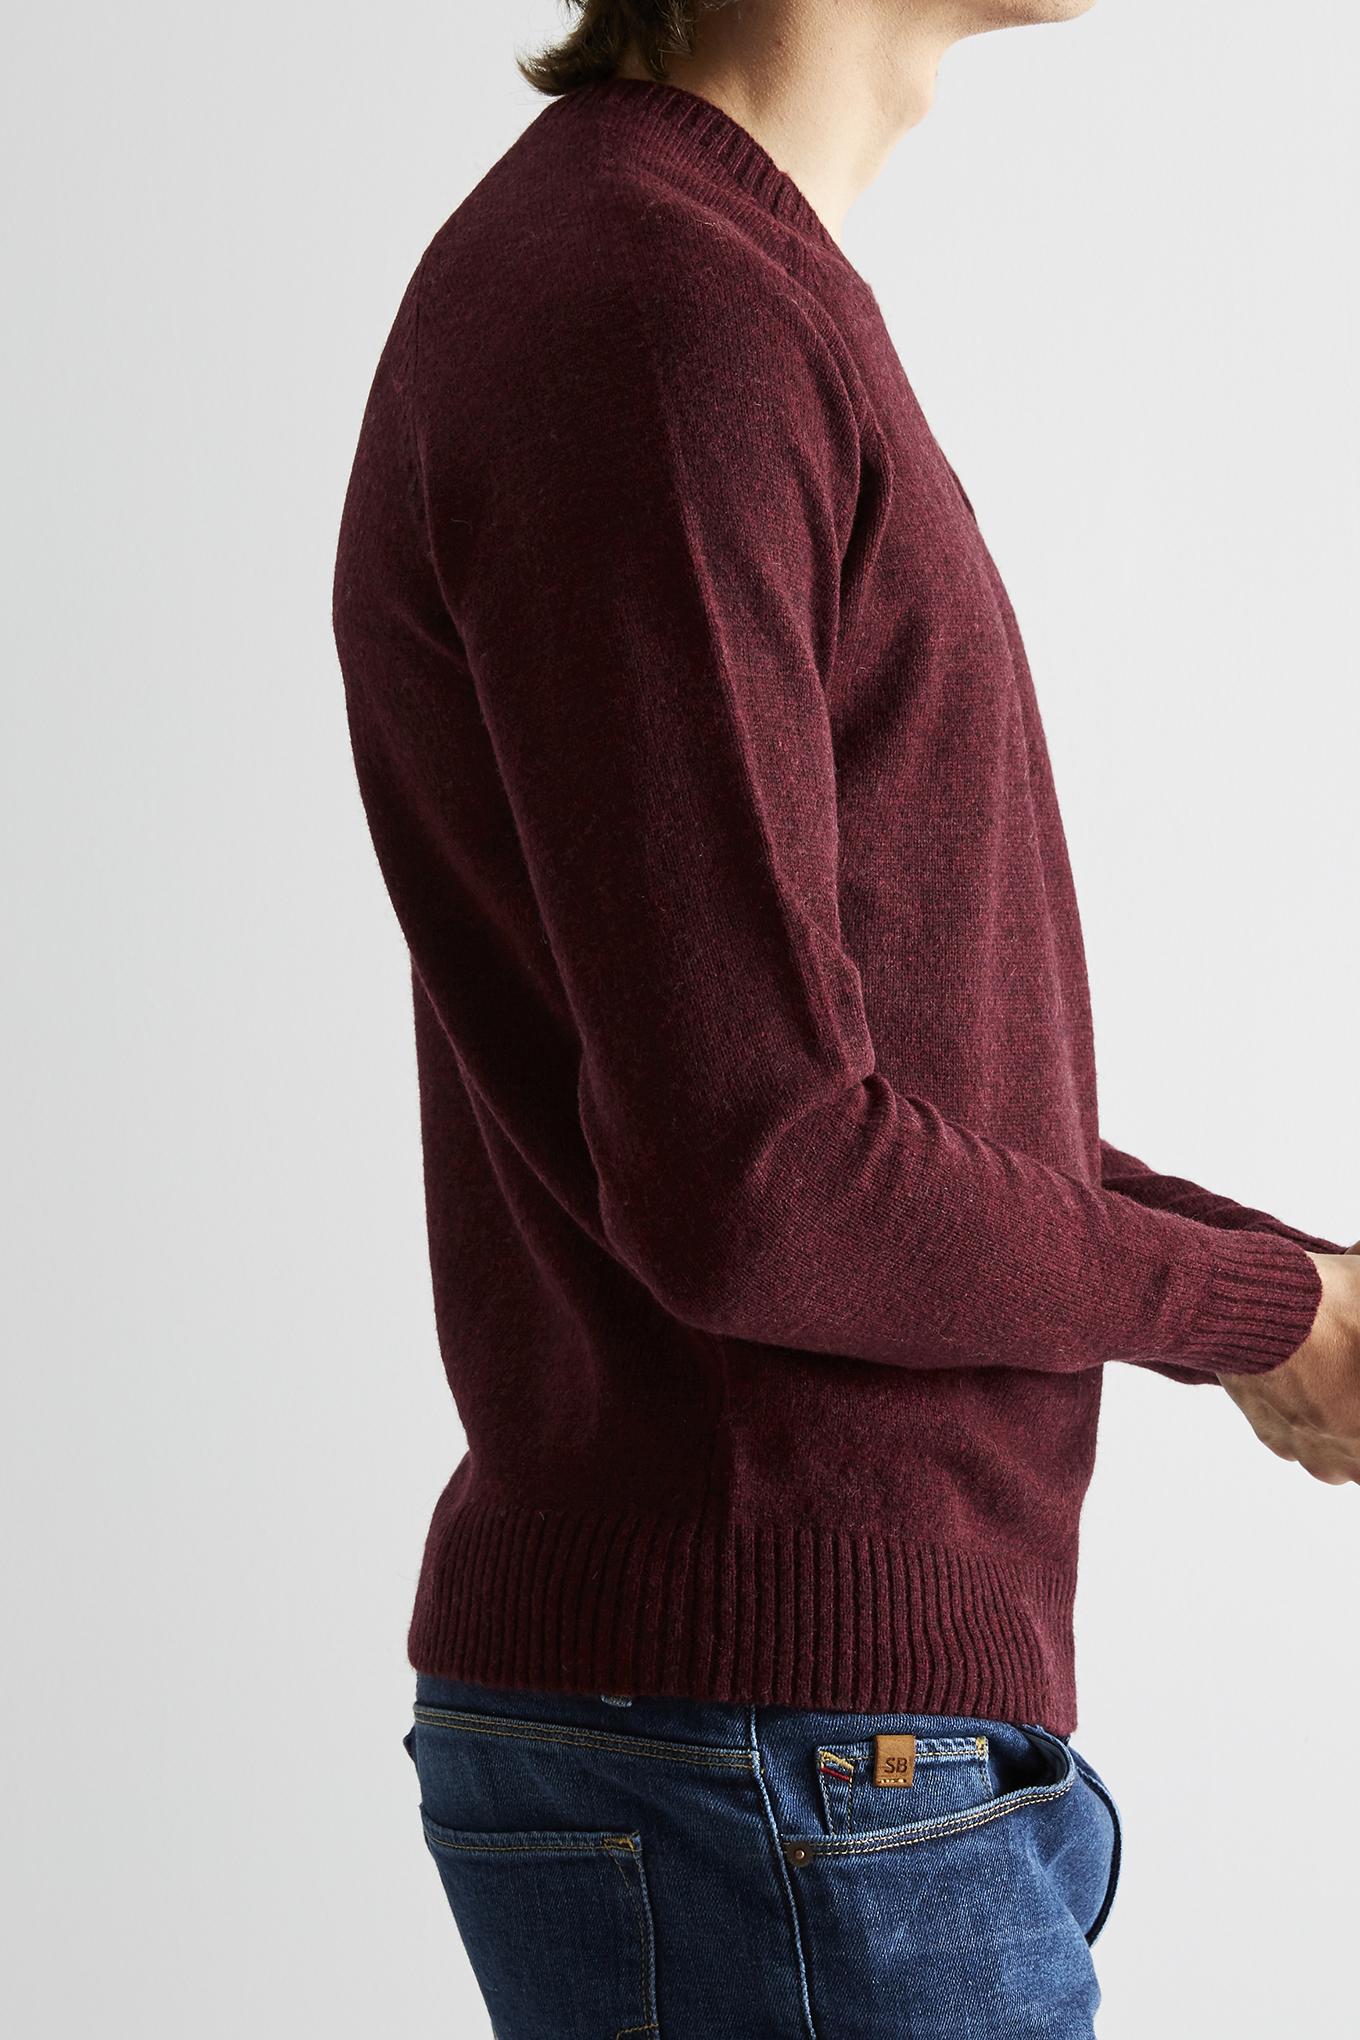 Sweater Bordeaux Classic Man